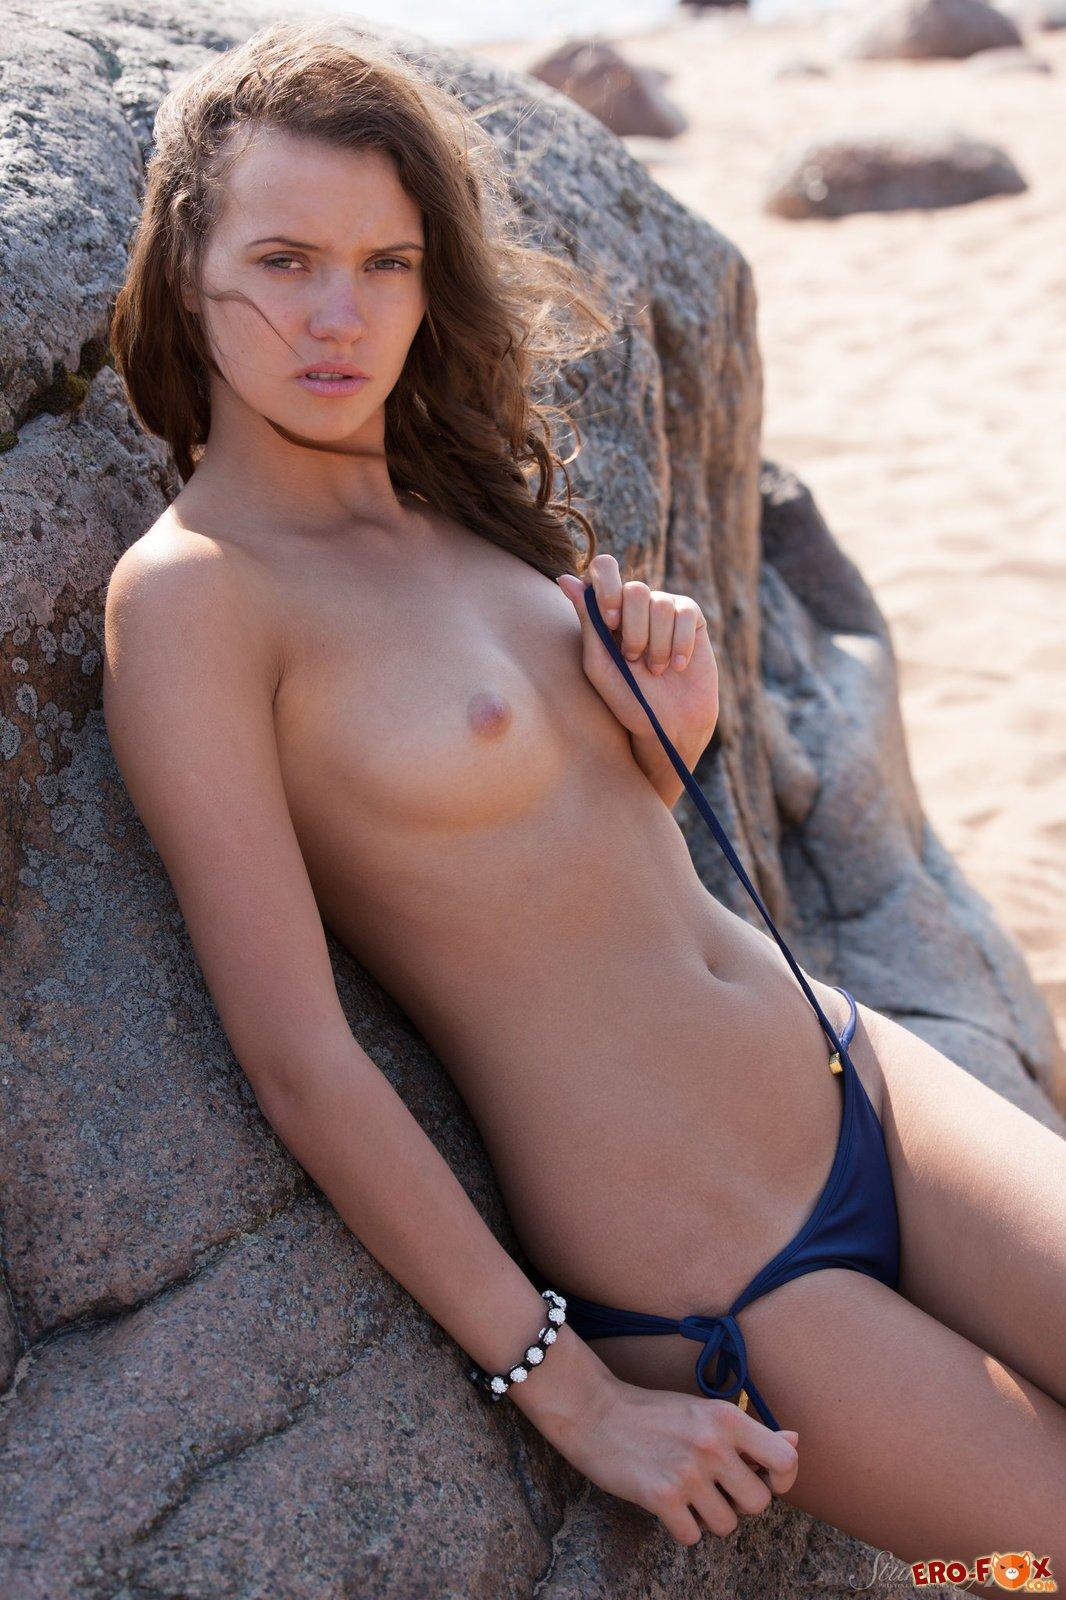 Красивая голая девушка на камне